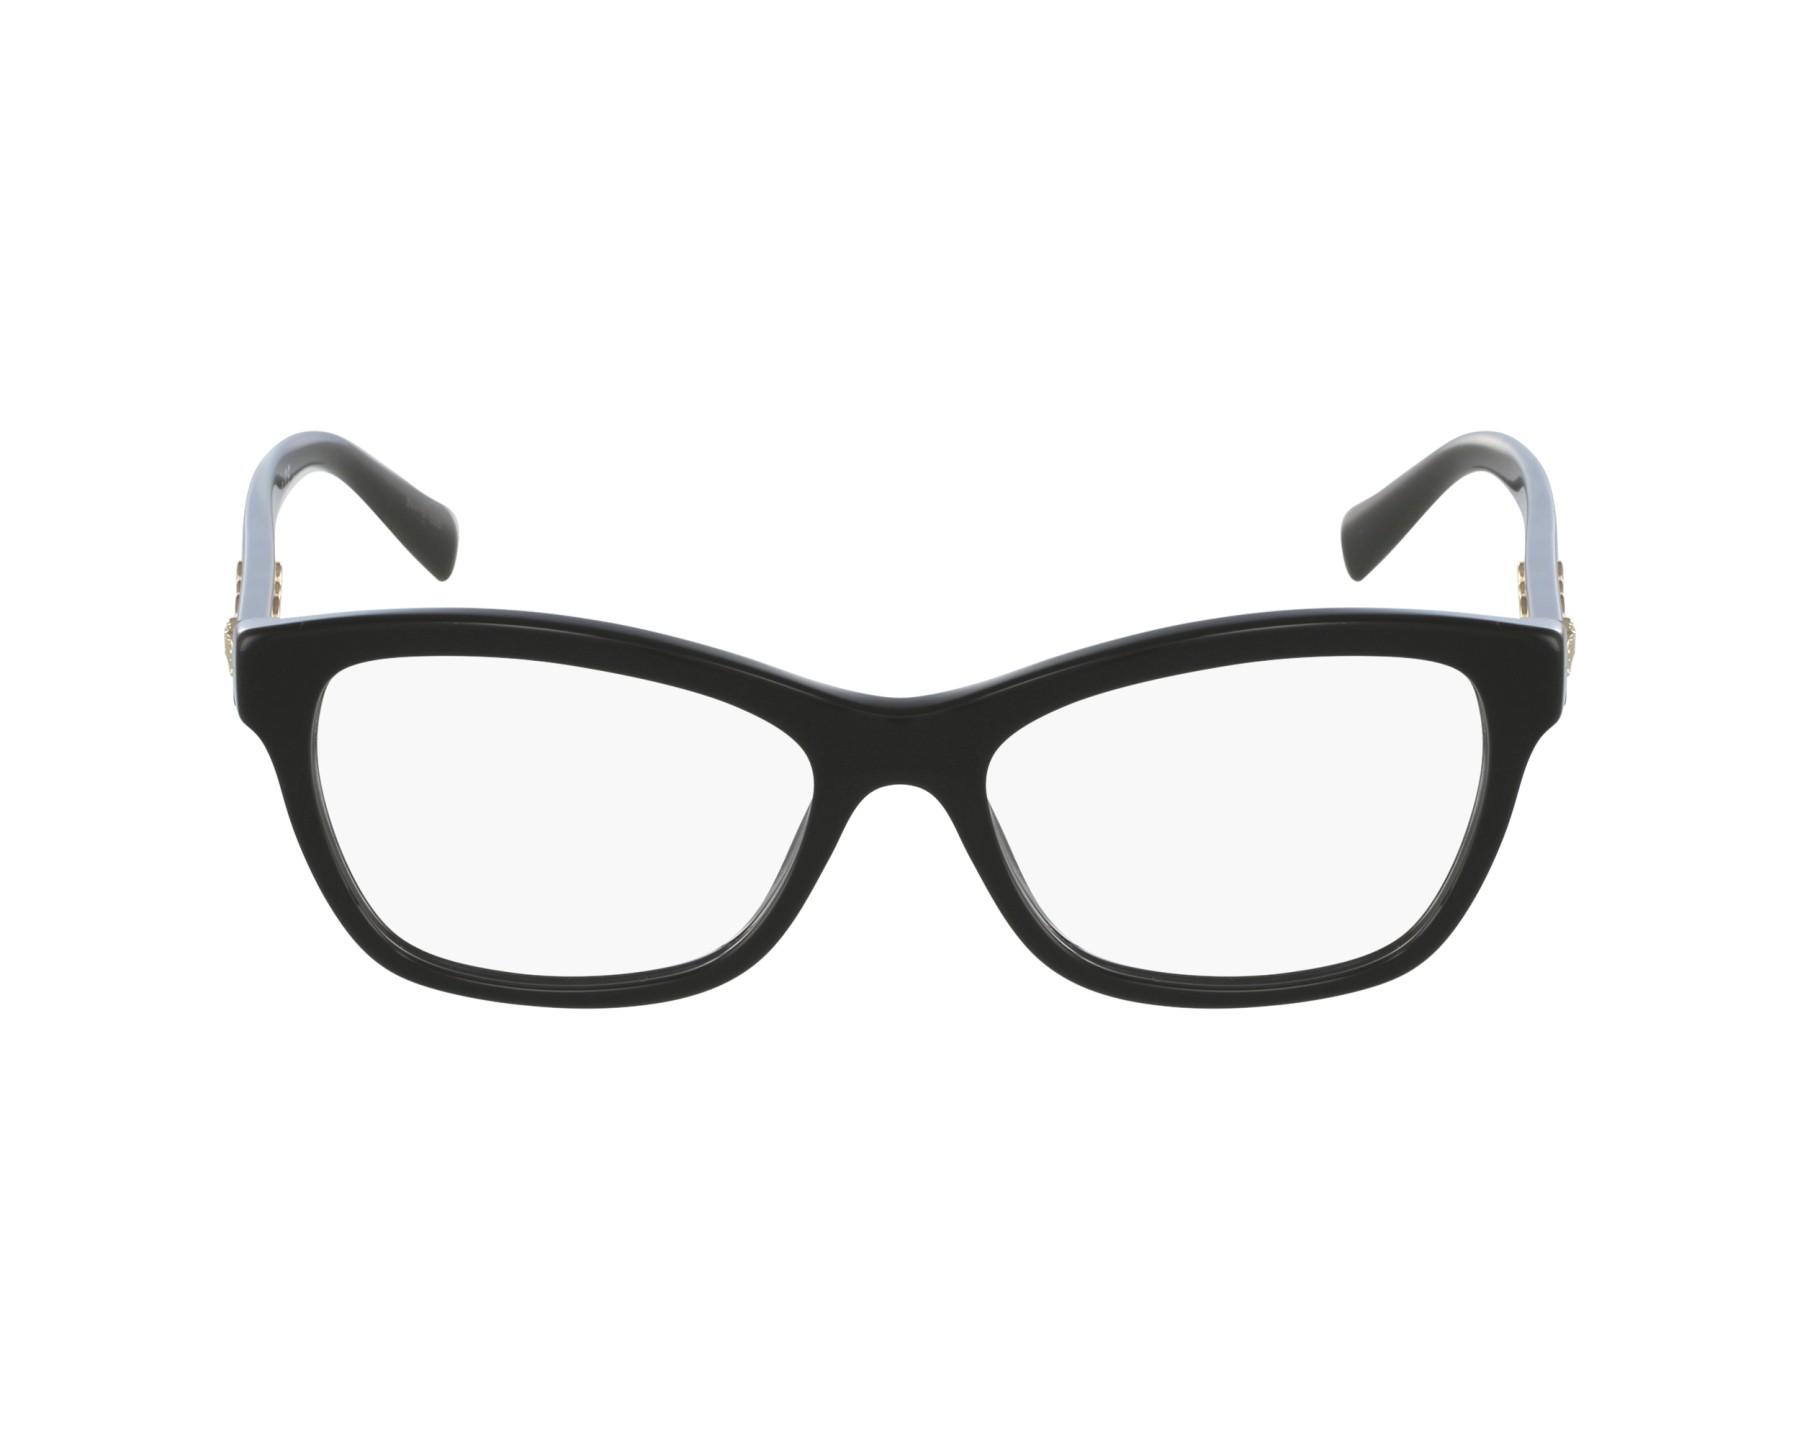 2f43fa097a8 eyeglasses Versace VE-3225 GB1 - Black profile view